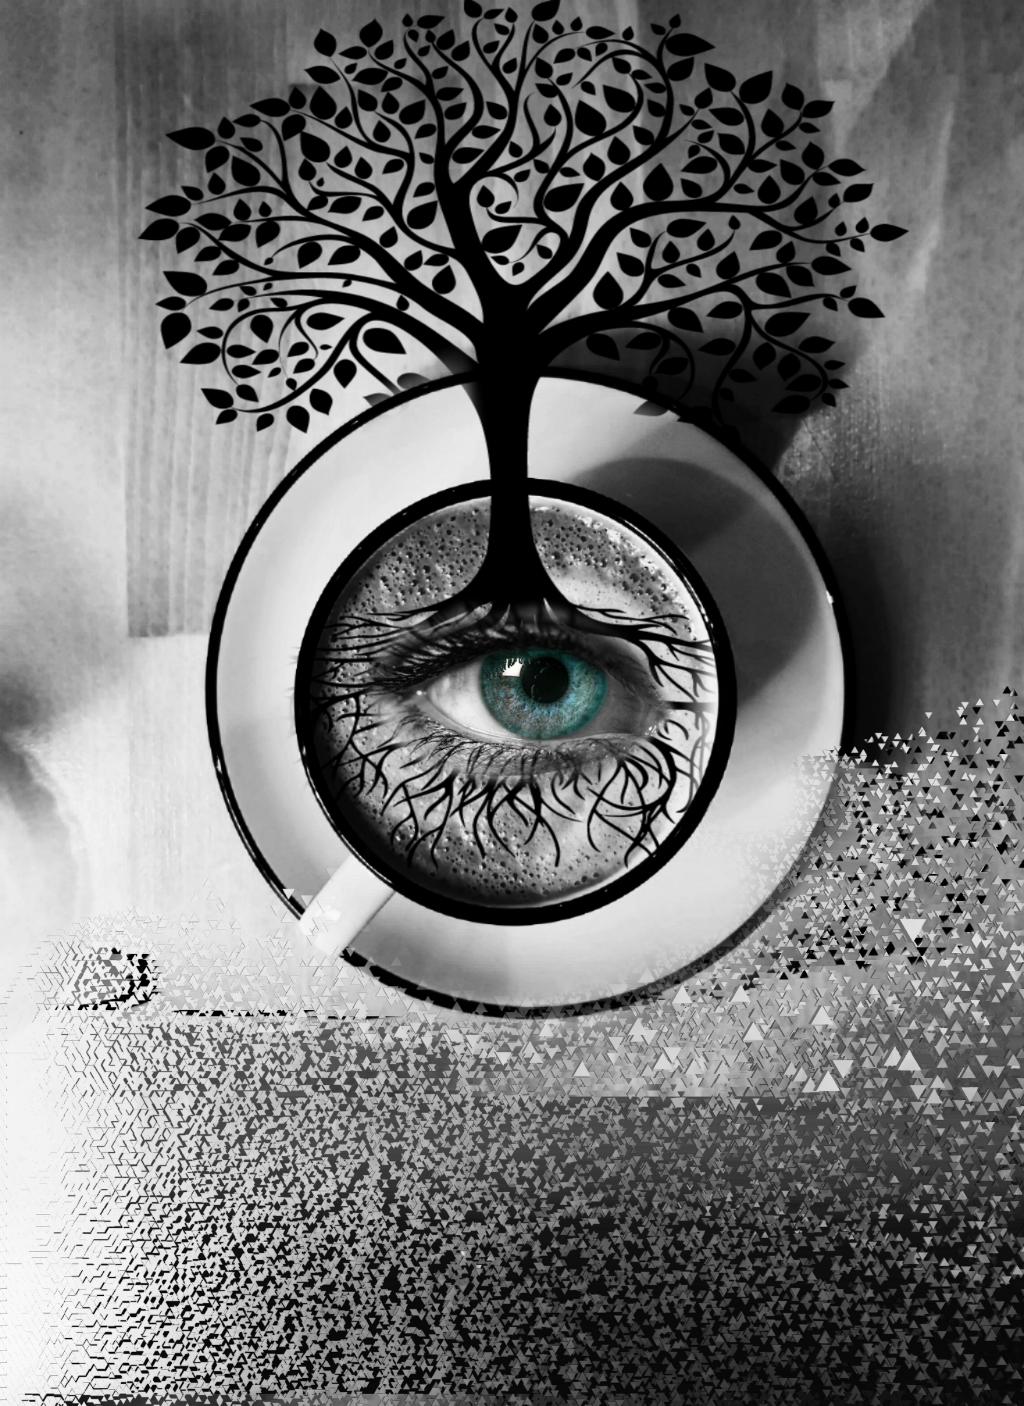 #freetoedit #dispersiontool #treeoflife  #irccoffeetime #coffeetime #blackandwhite